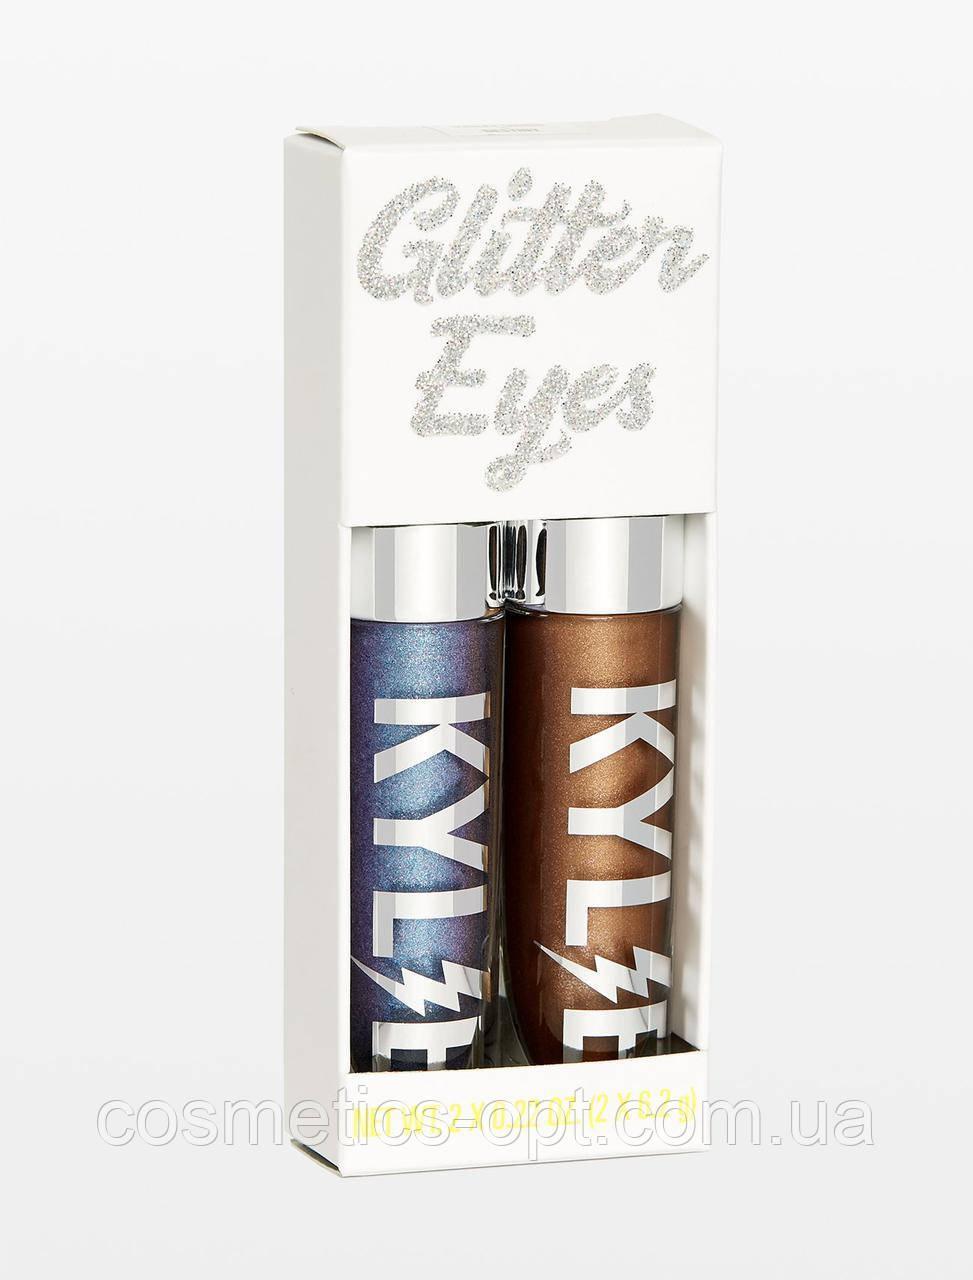 Жидкие тени для глаз Kylie Glitter Eyes (реплика)